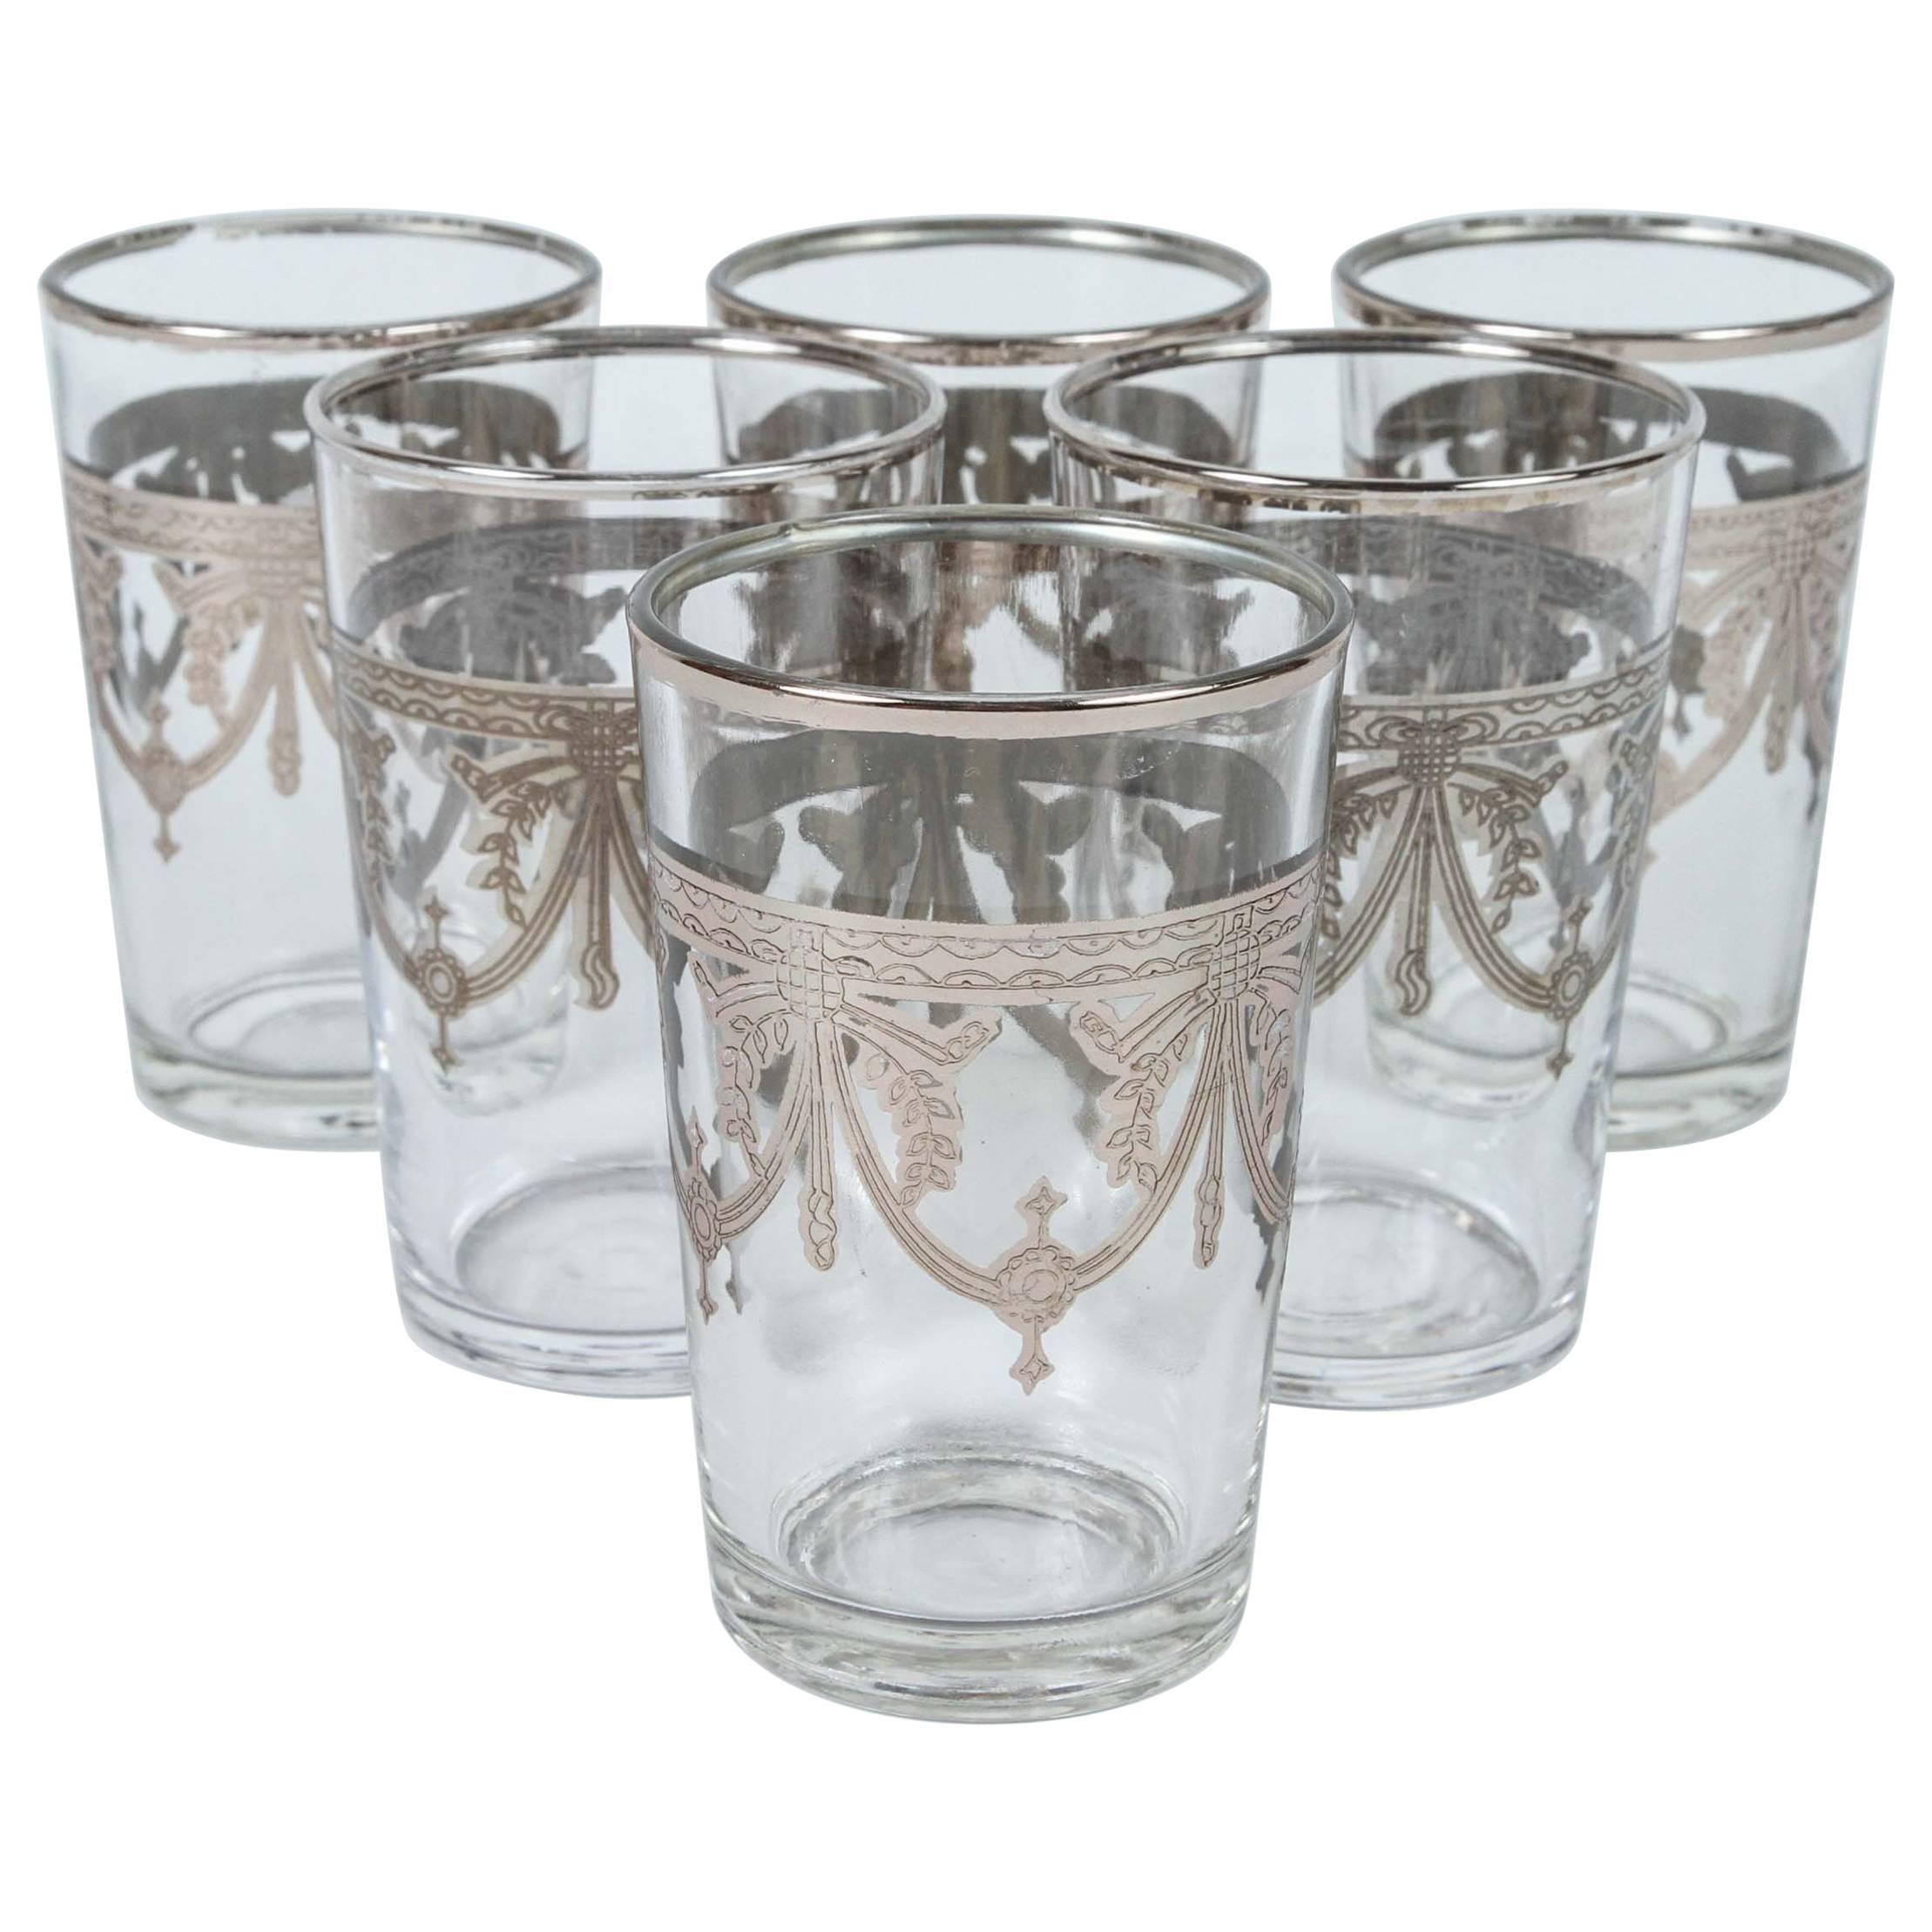 Set of Six Glasses with Silver Overlay Raised Moorish Design